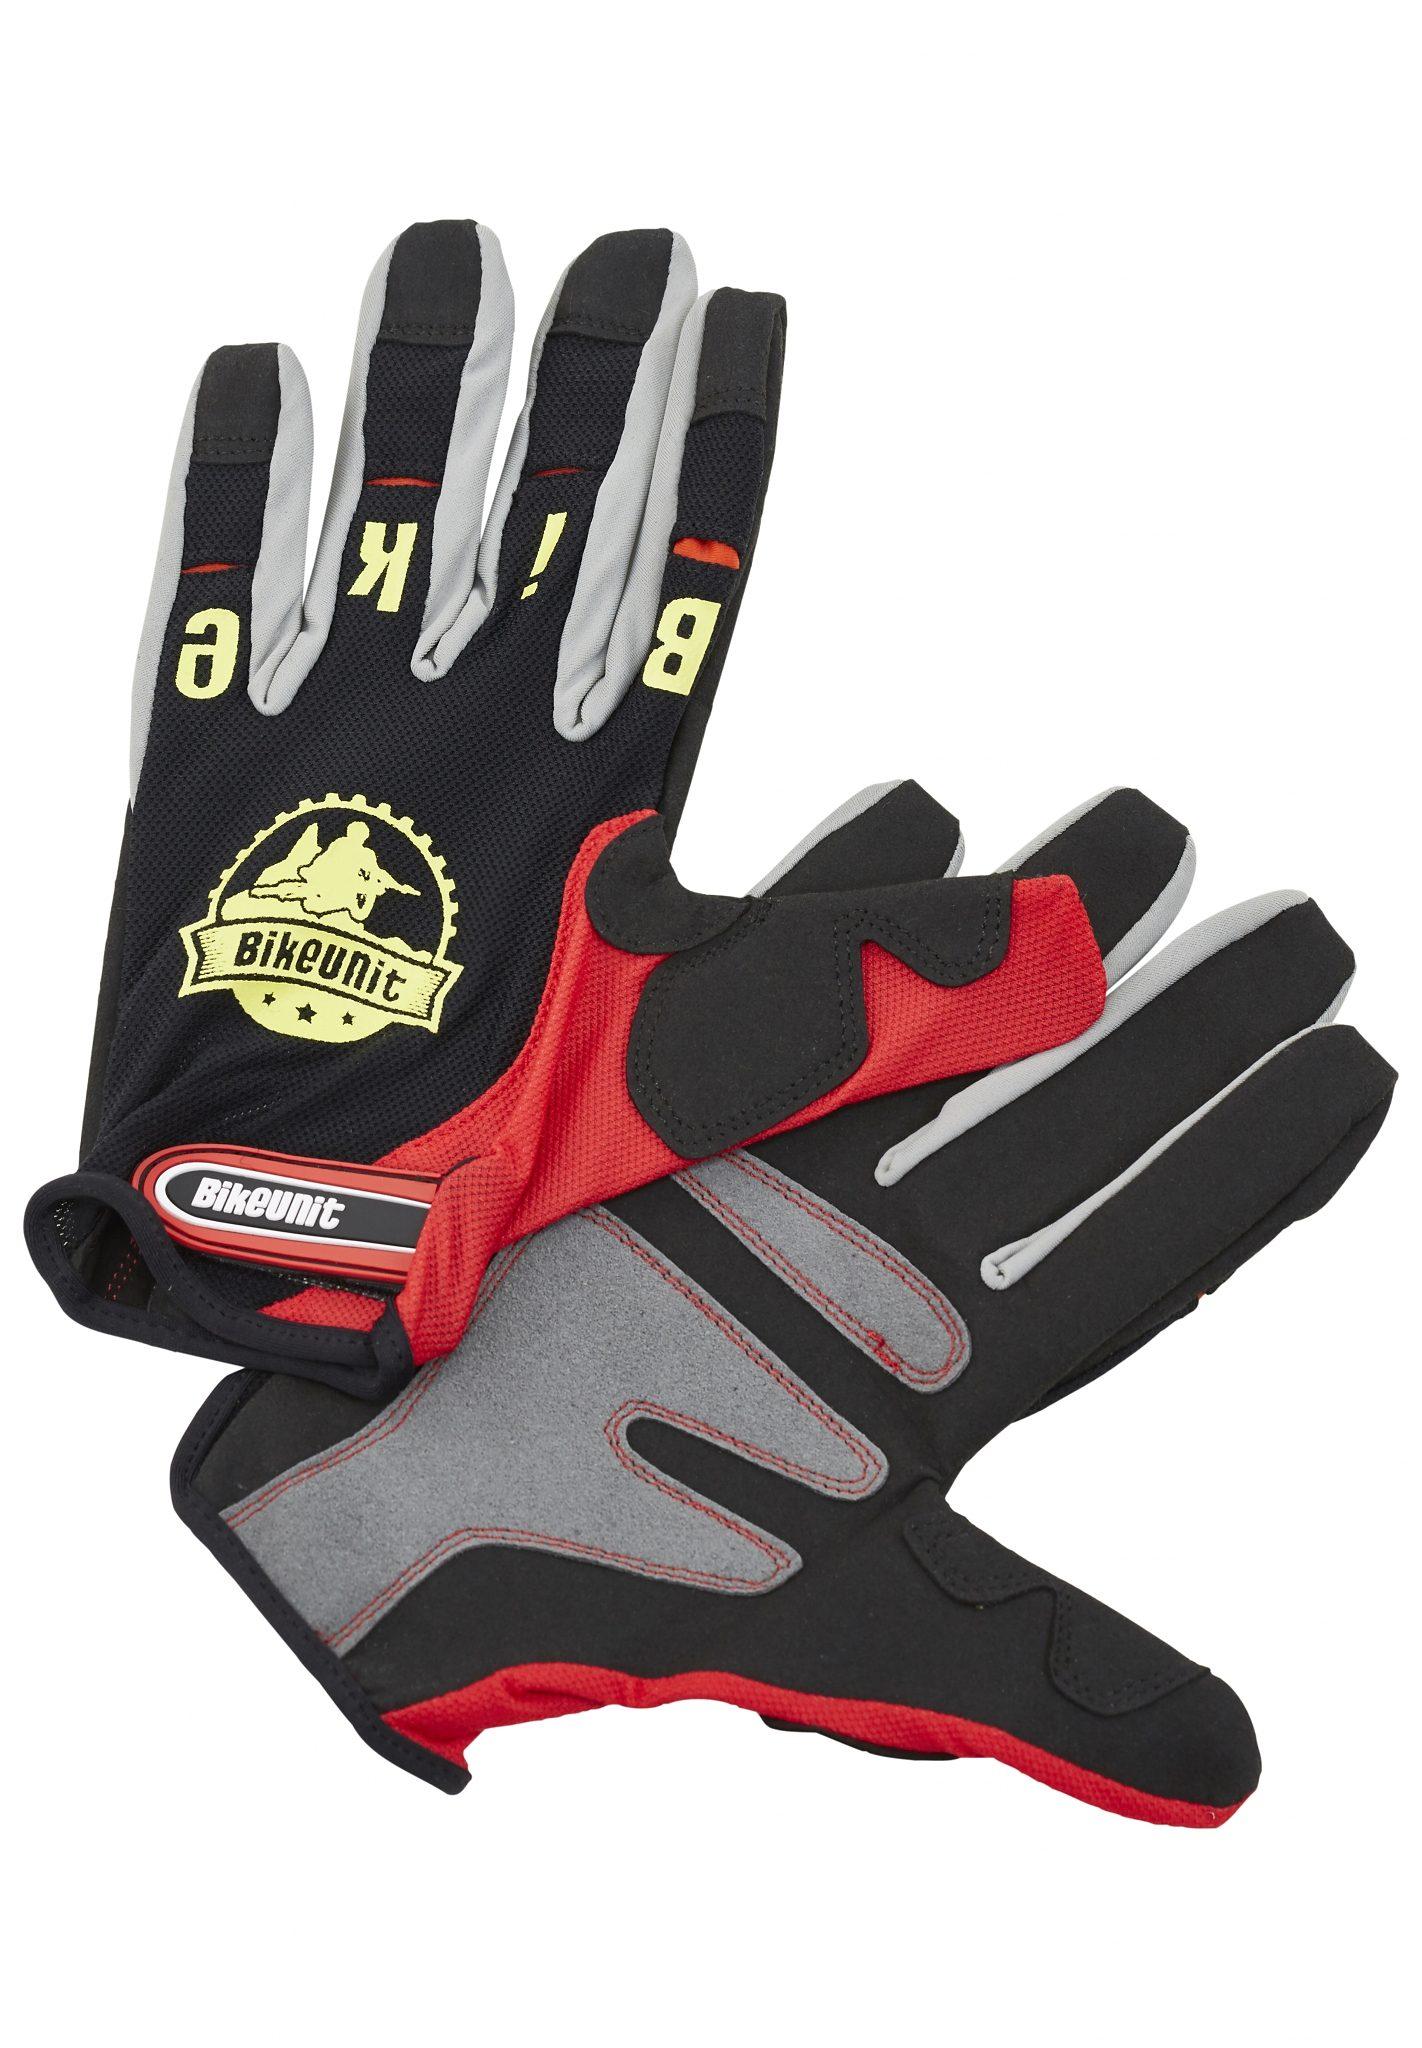 Bikeunit Fahrrad Handschuhe »Bikeunit Gravity Pro Bike Glove«